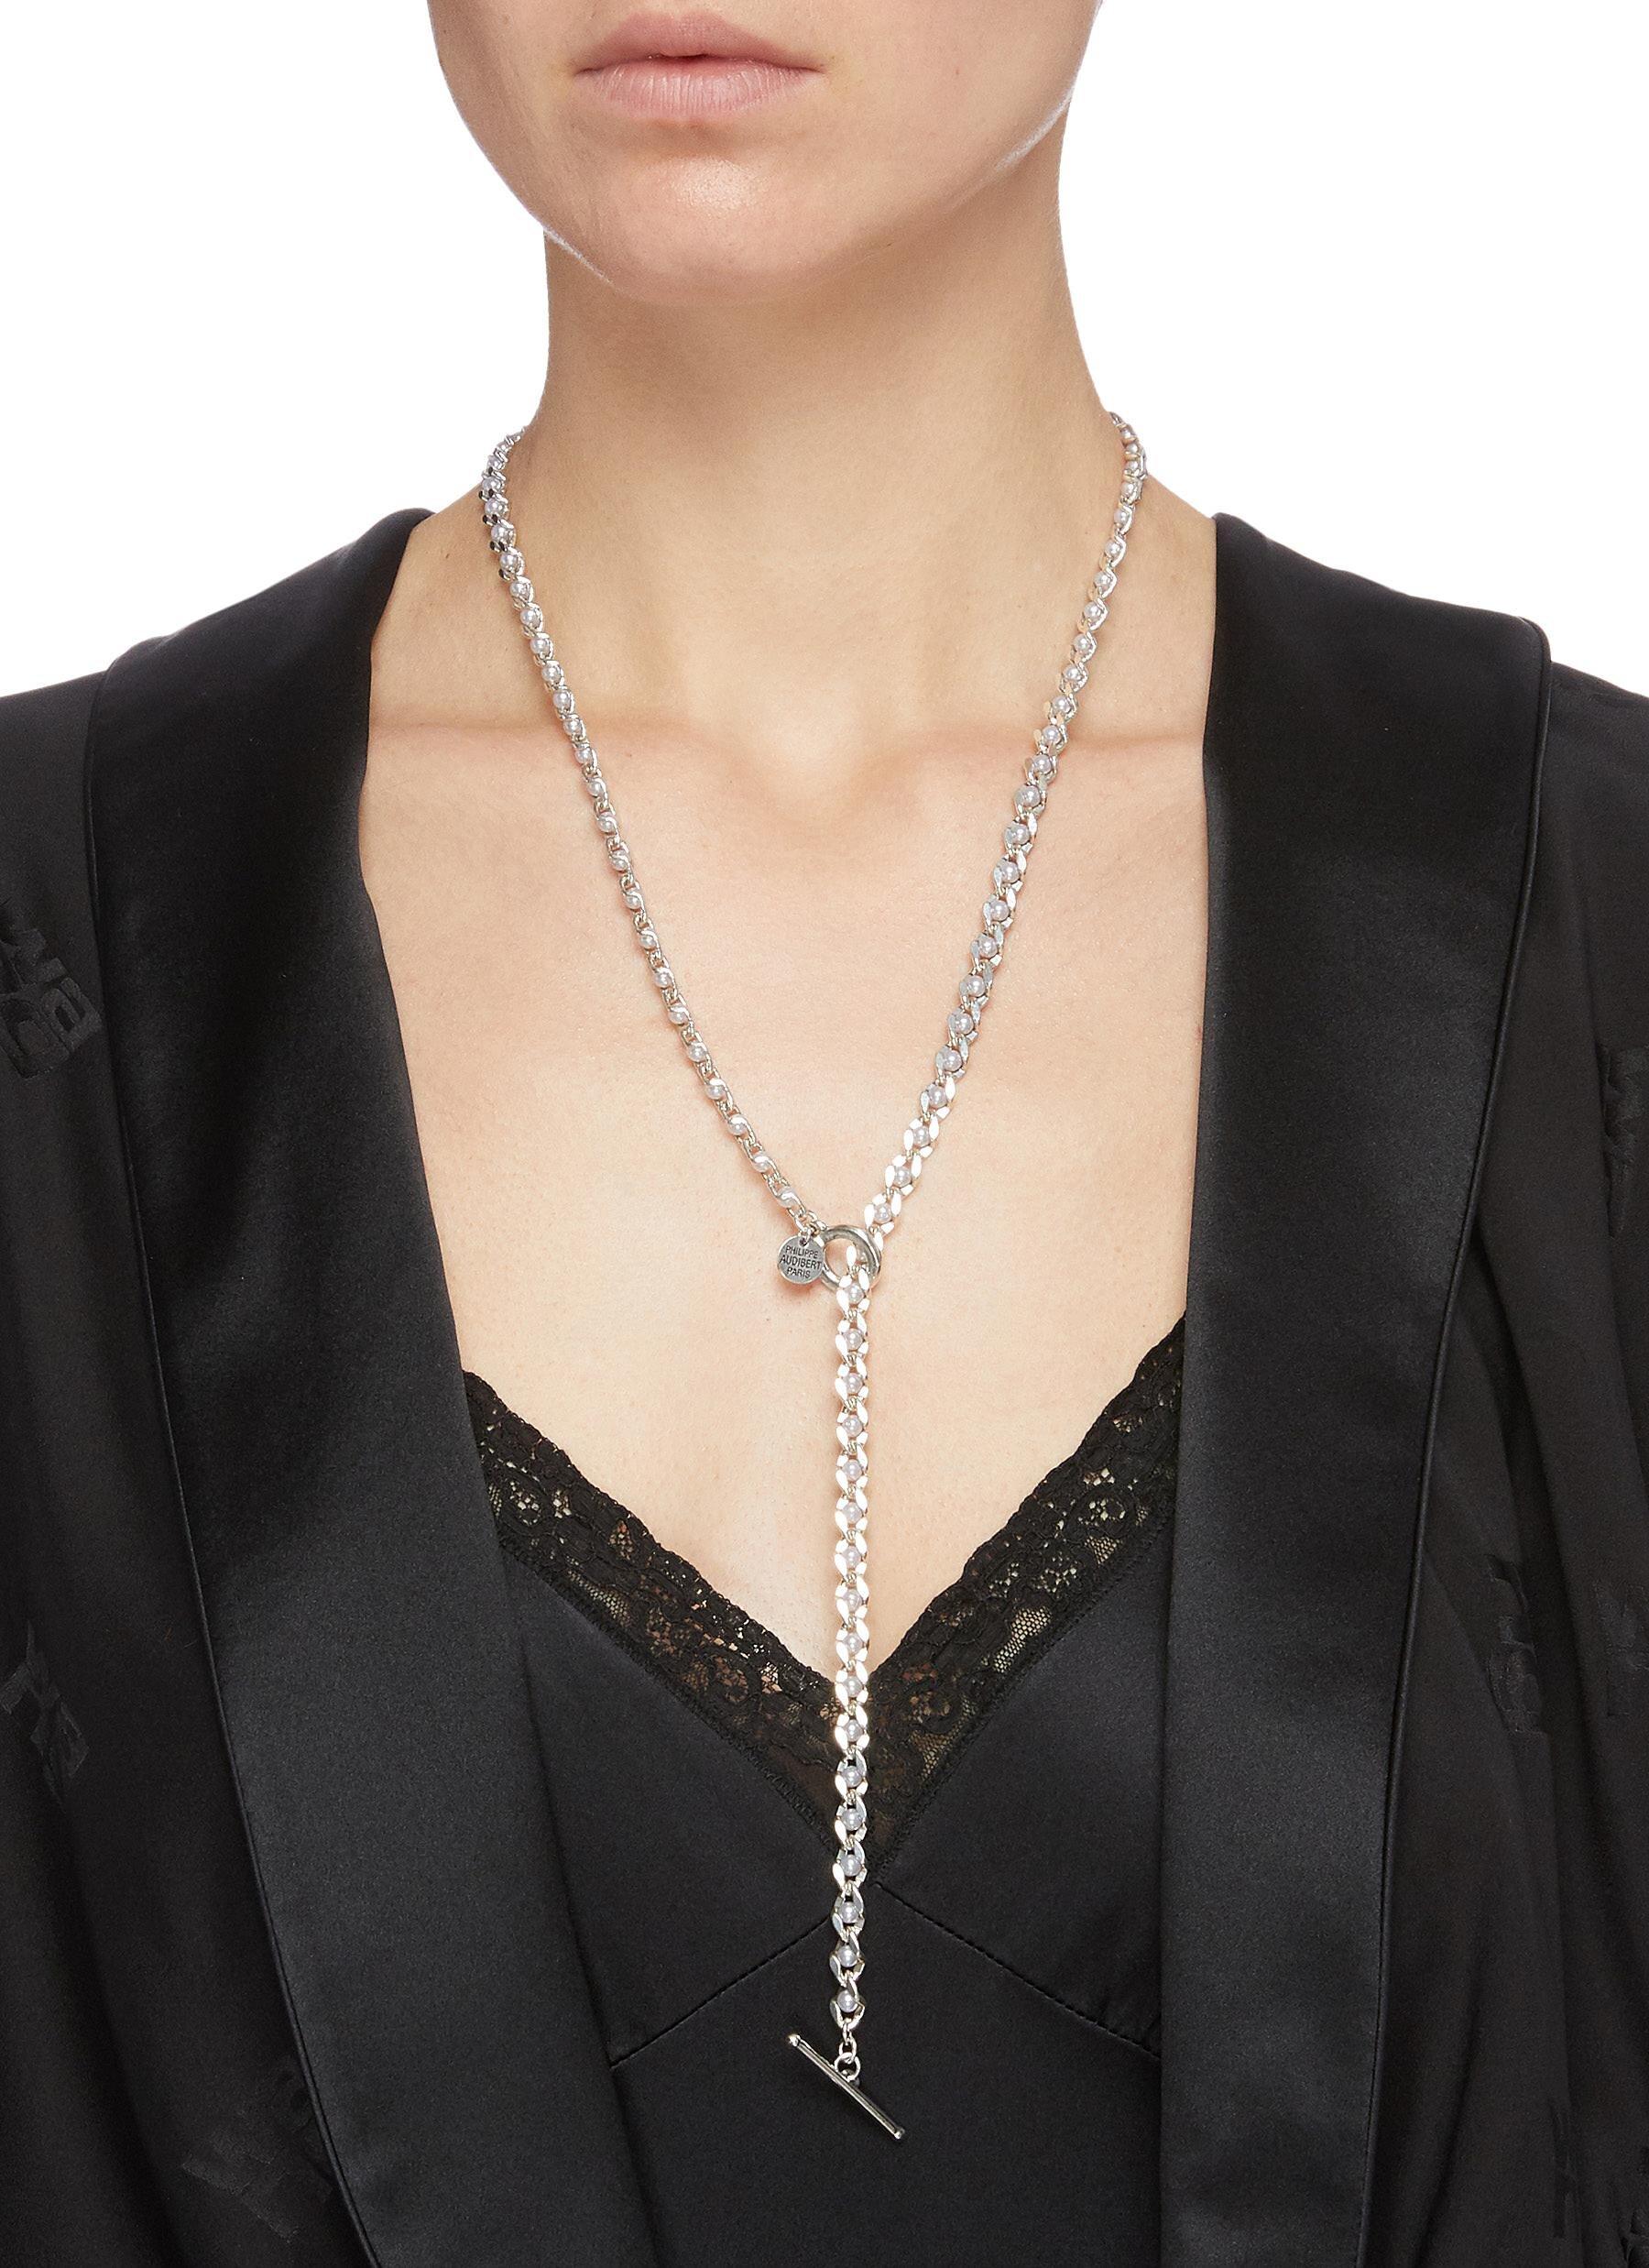 Philippe Audibert 'jayde' Faux Pearl Chain Lariat Necklace  HKD$1,390